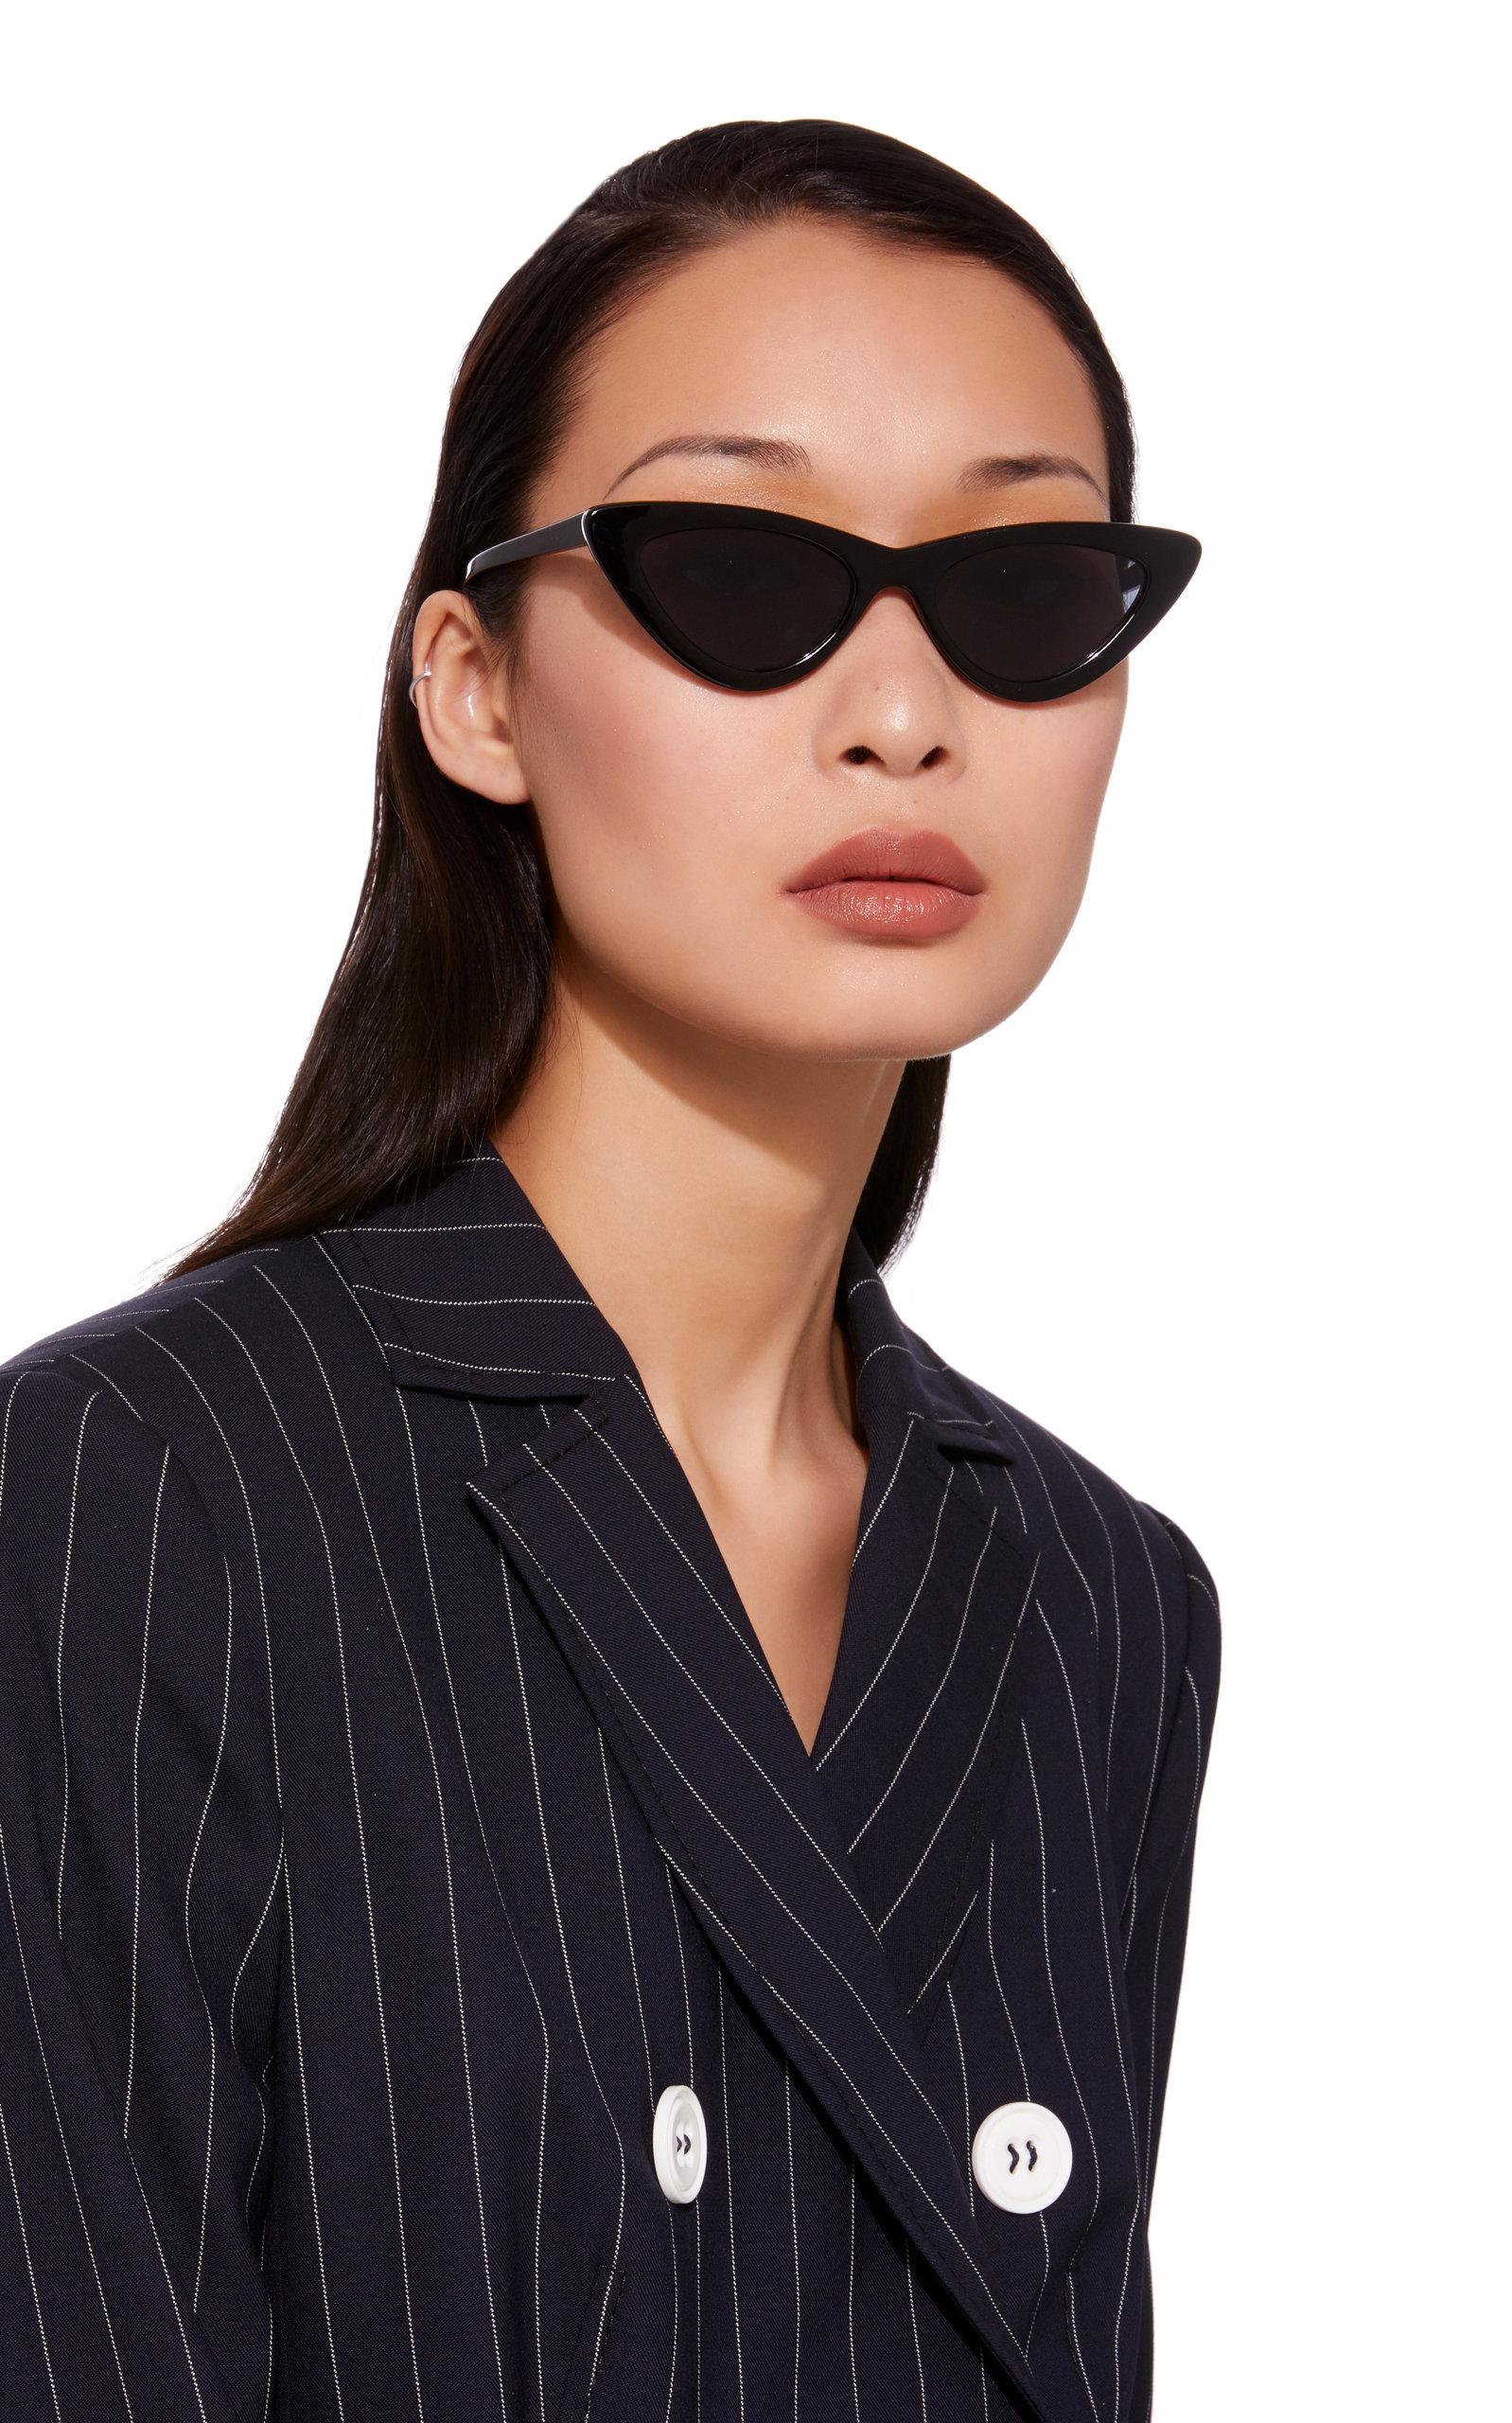 763d7ea57b83 The Last Lolita Cat-Eye Sunglasses by Adam Selman X Le Specs